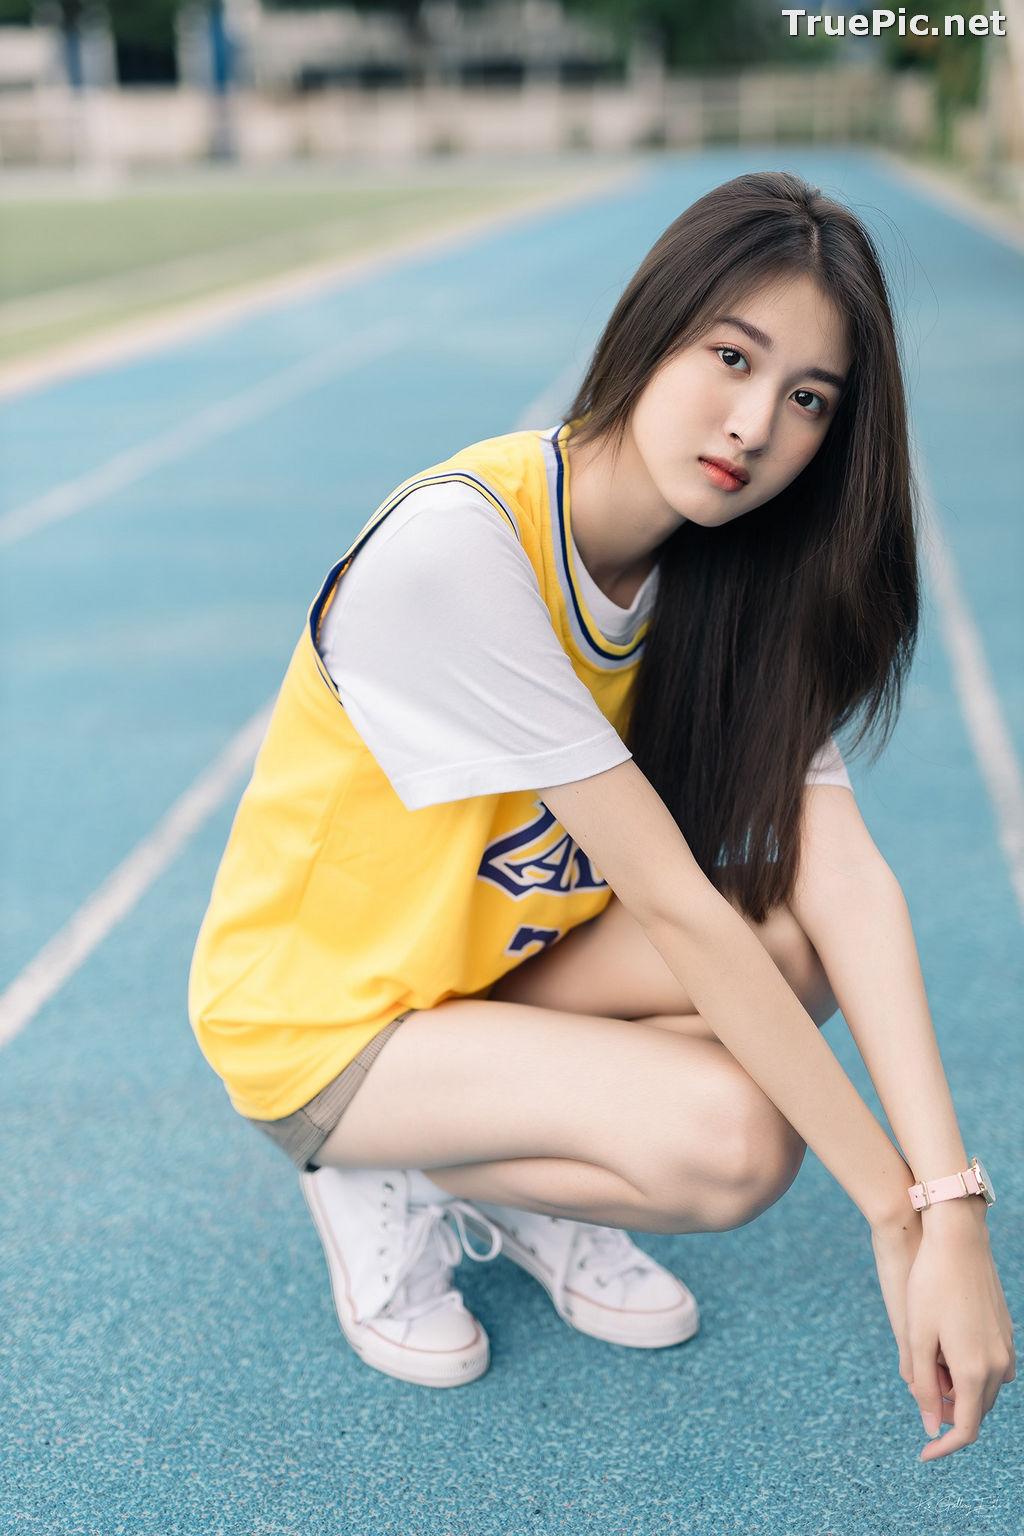 Image Thailand Beautiful Girl - View Benyapa - Long Hair Sport Girl - TruePic.net - Picture-4